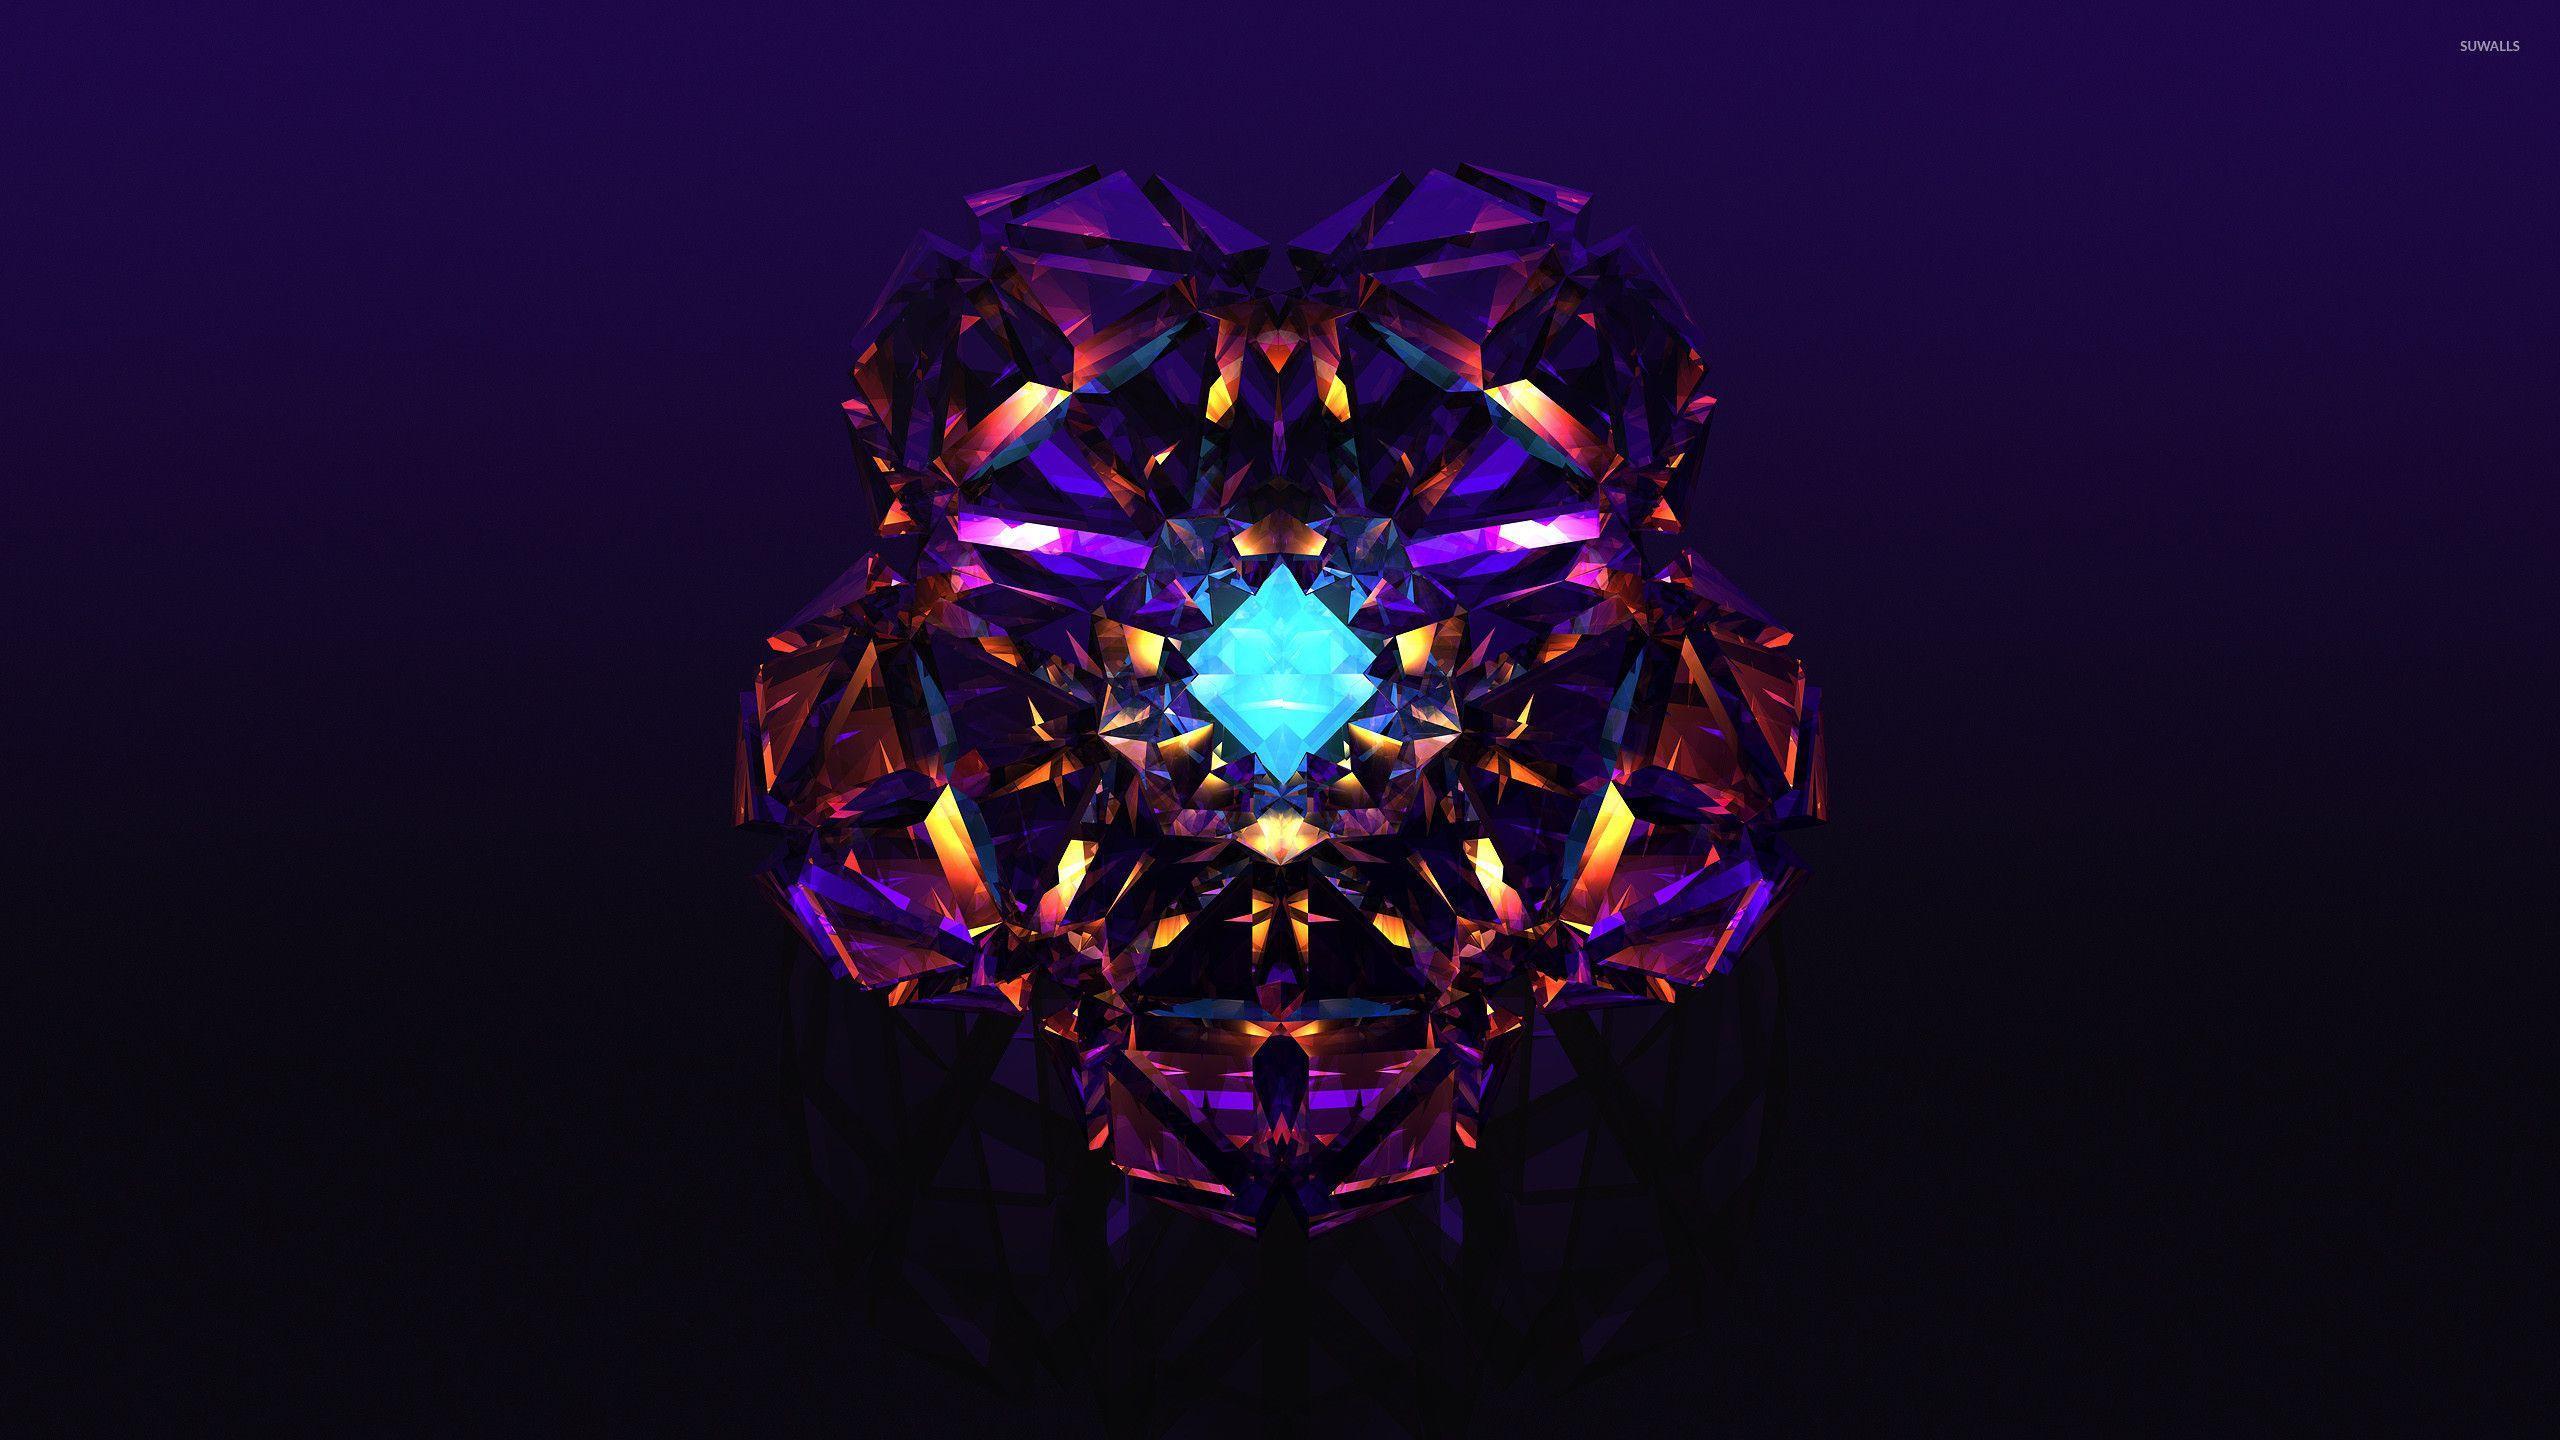 Purple Diamond Wallpapers Top Free Purple Diamond Backgrounds